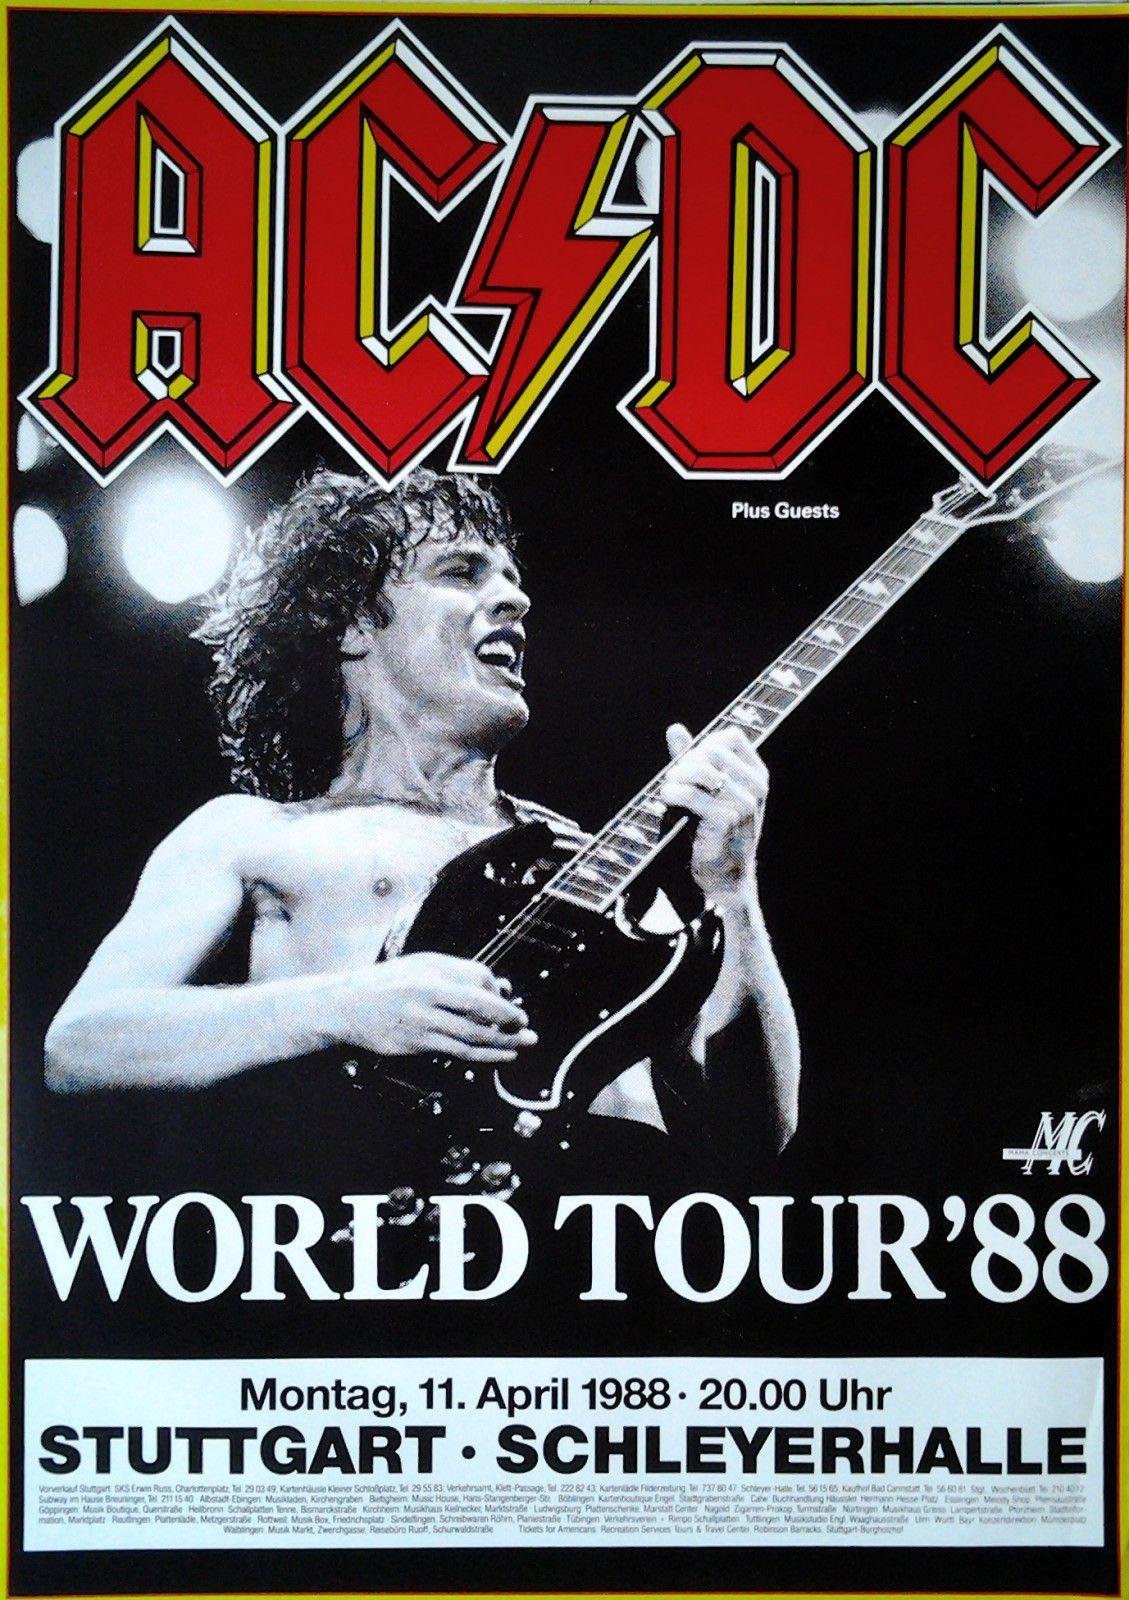 Mymindlostme Ac Dc 1988 World Tour Concert Poster Germany Special Guest Dokken April 11 1988 Music Concert Posters Concert Posters Vintage Concert Posters